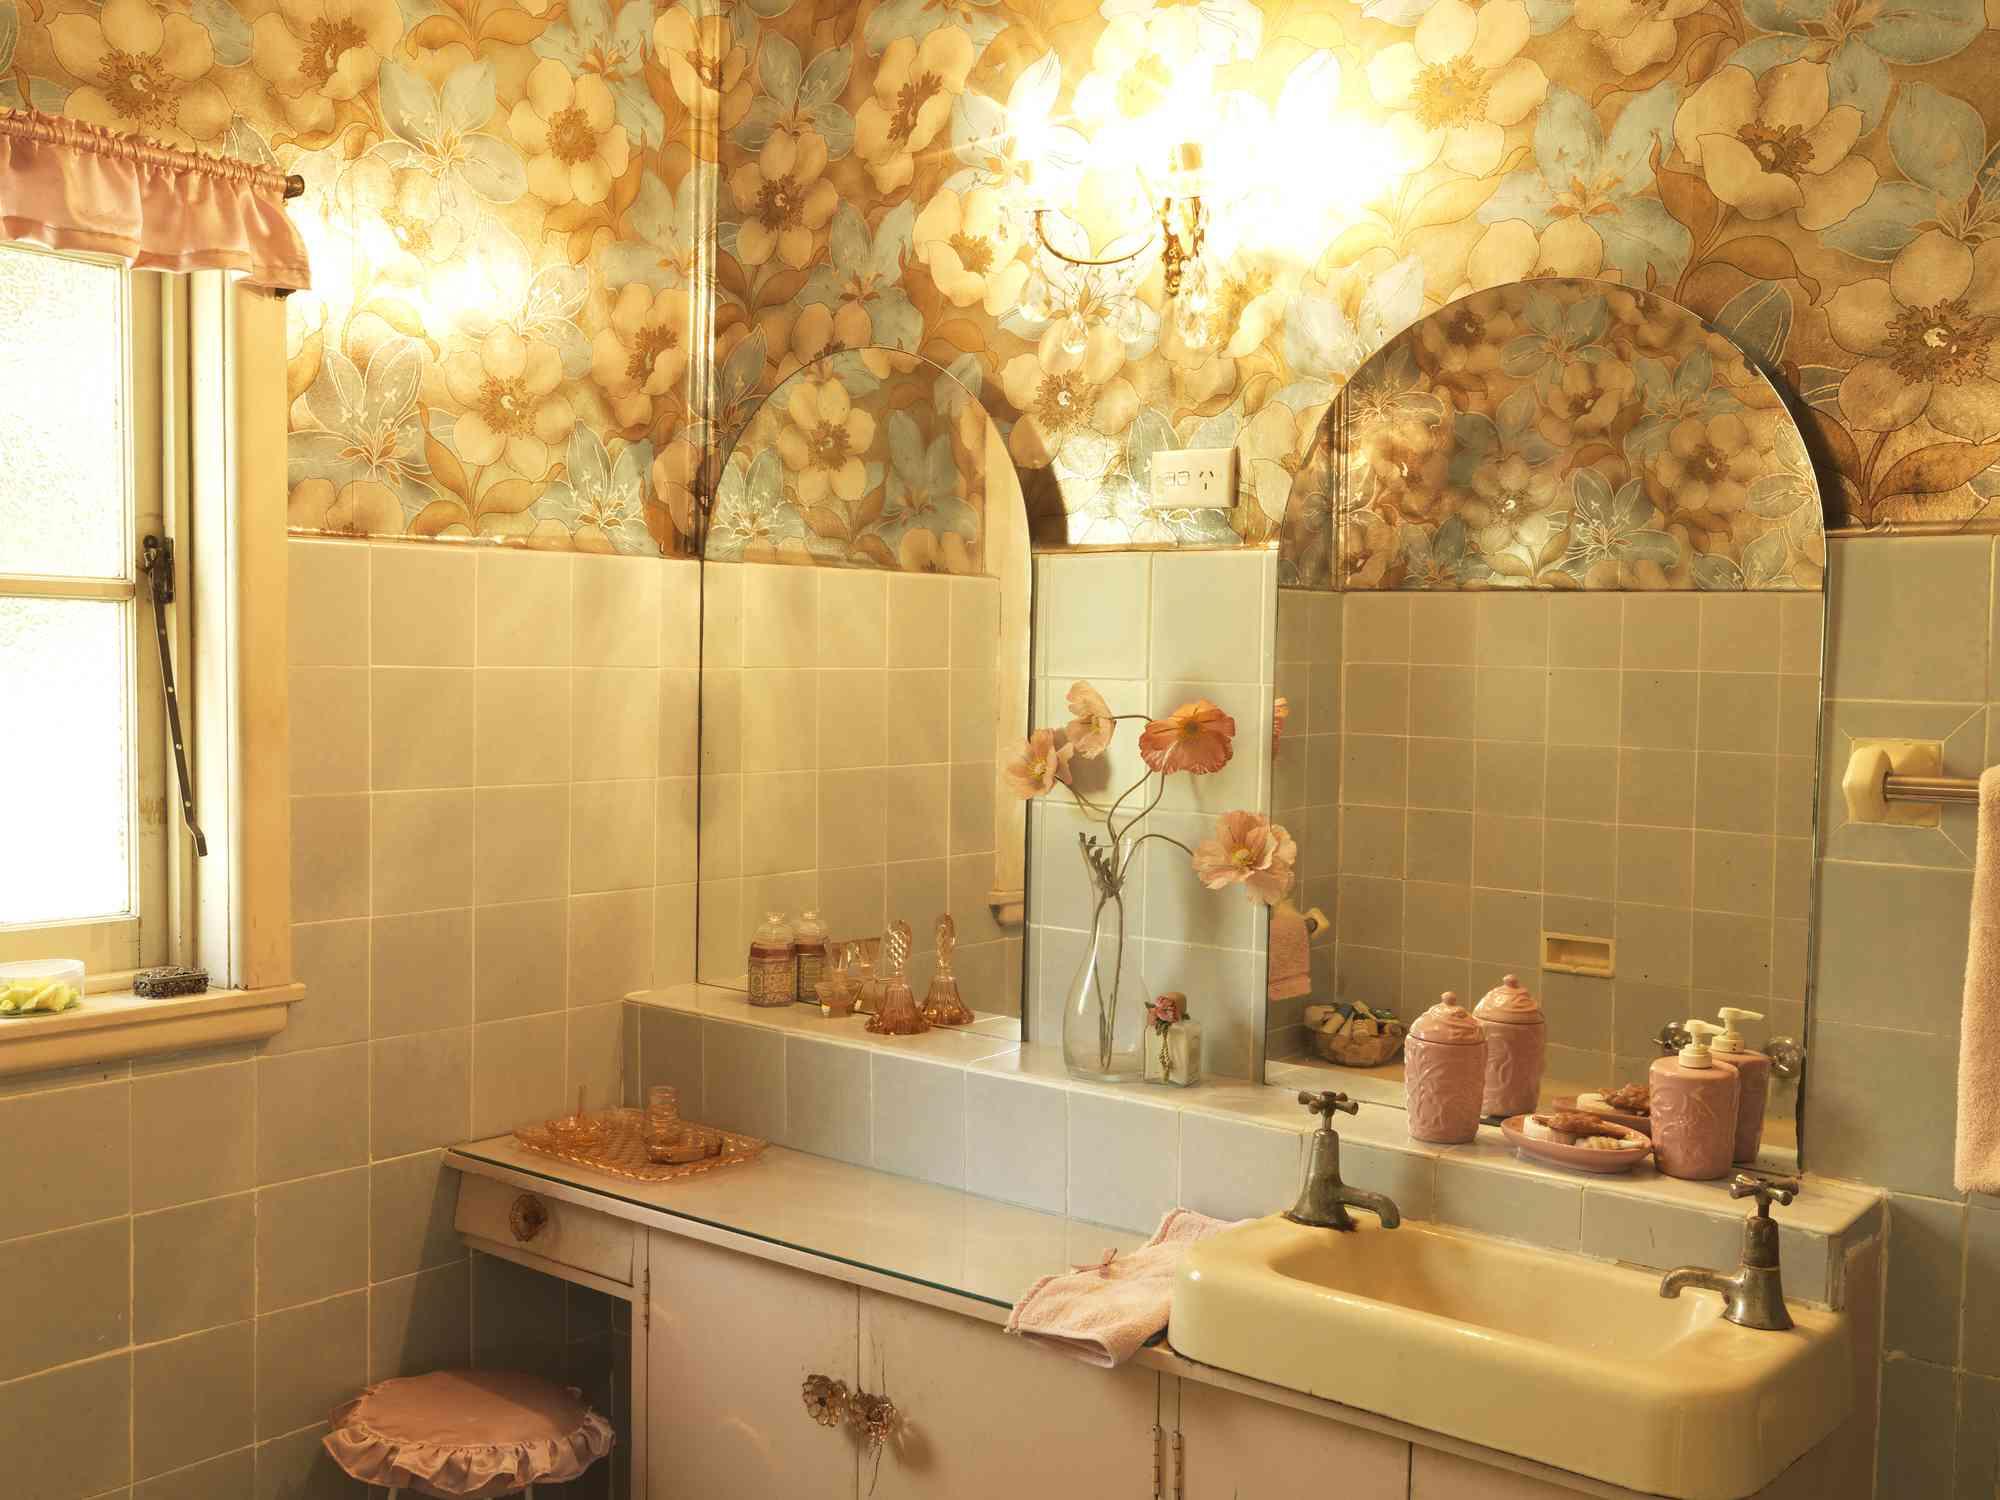 Vintage style wallpapered bathroom